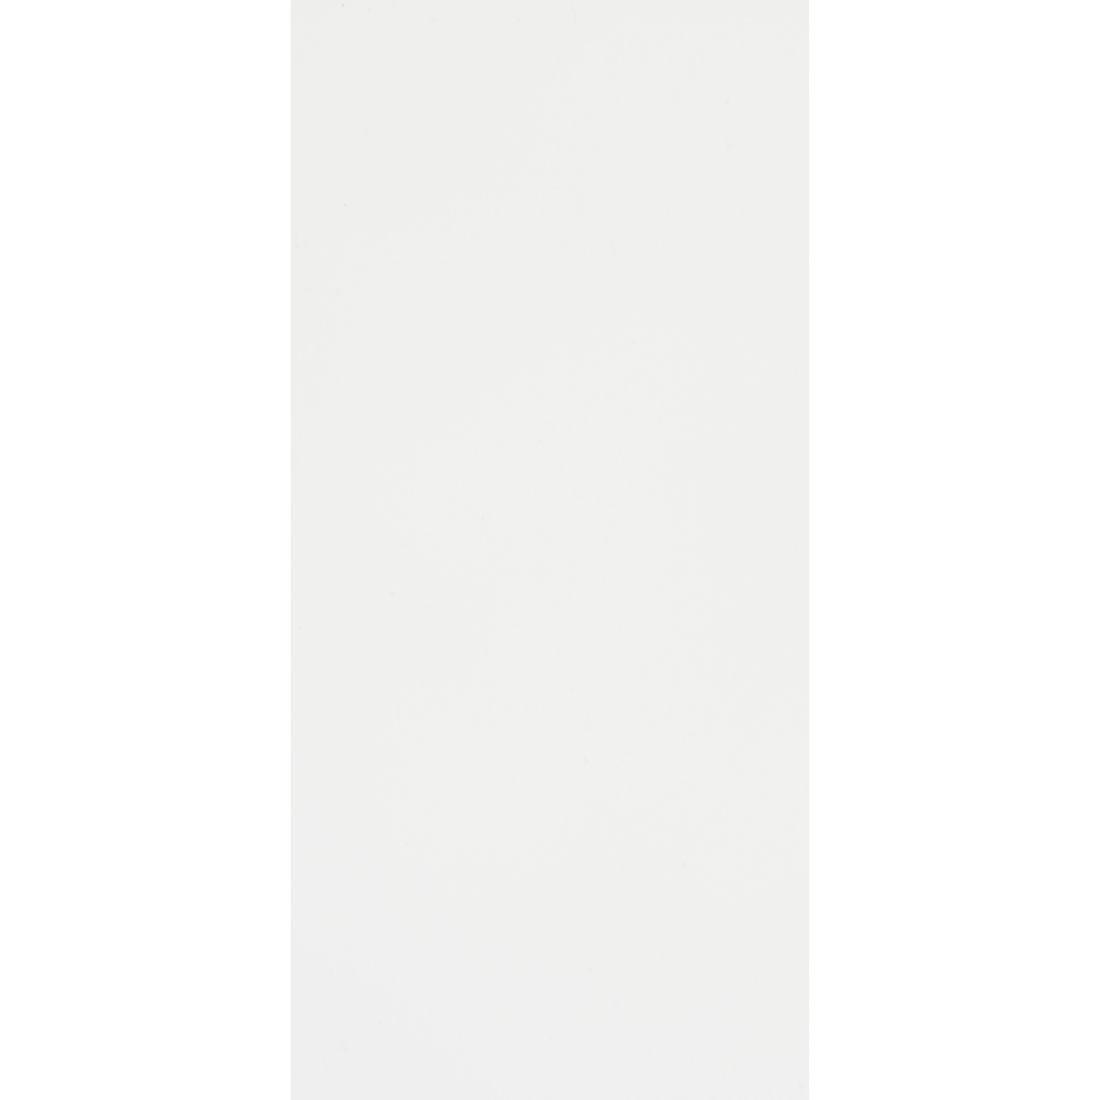 Classic Wall Lining Panel Polar Satin 2400 x 900 x 4.5mm